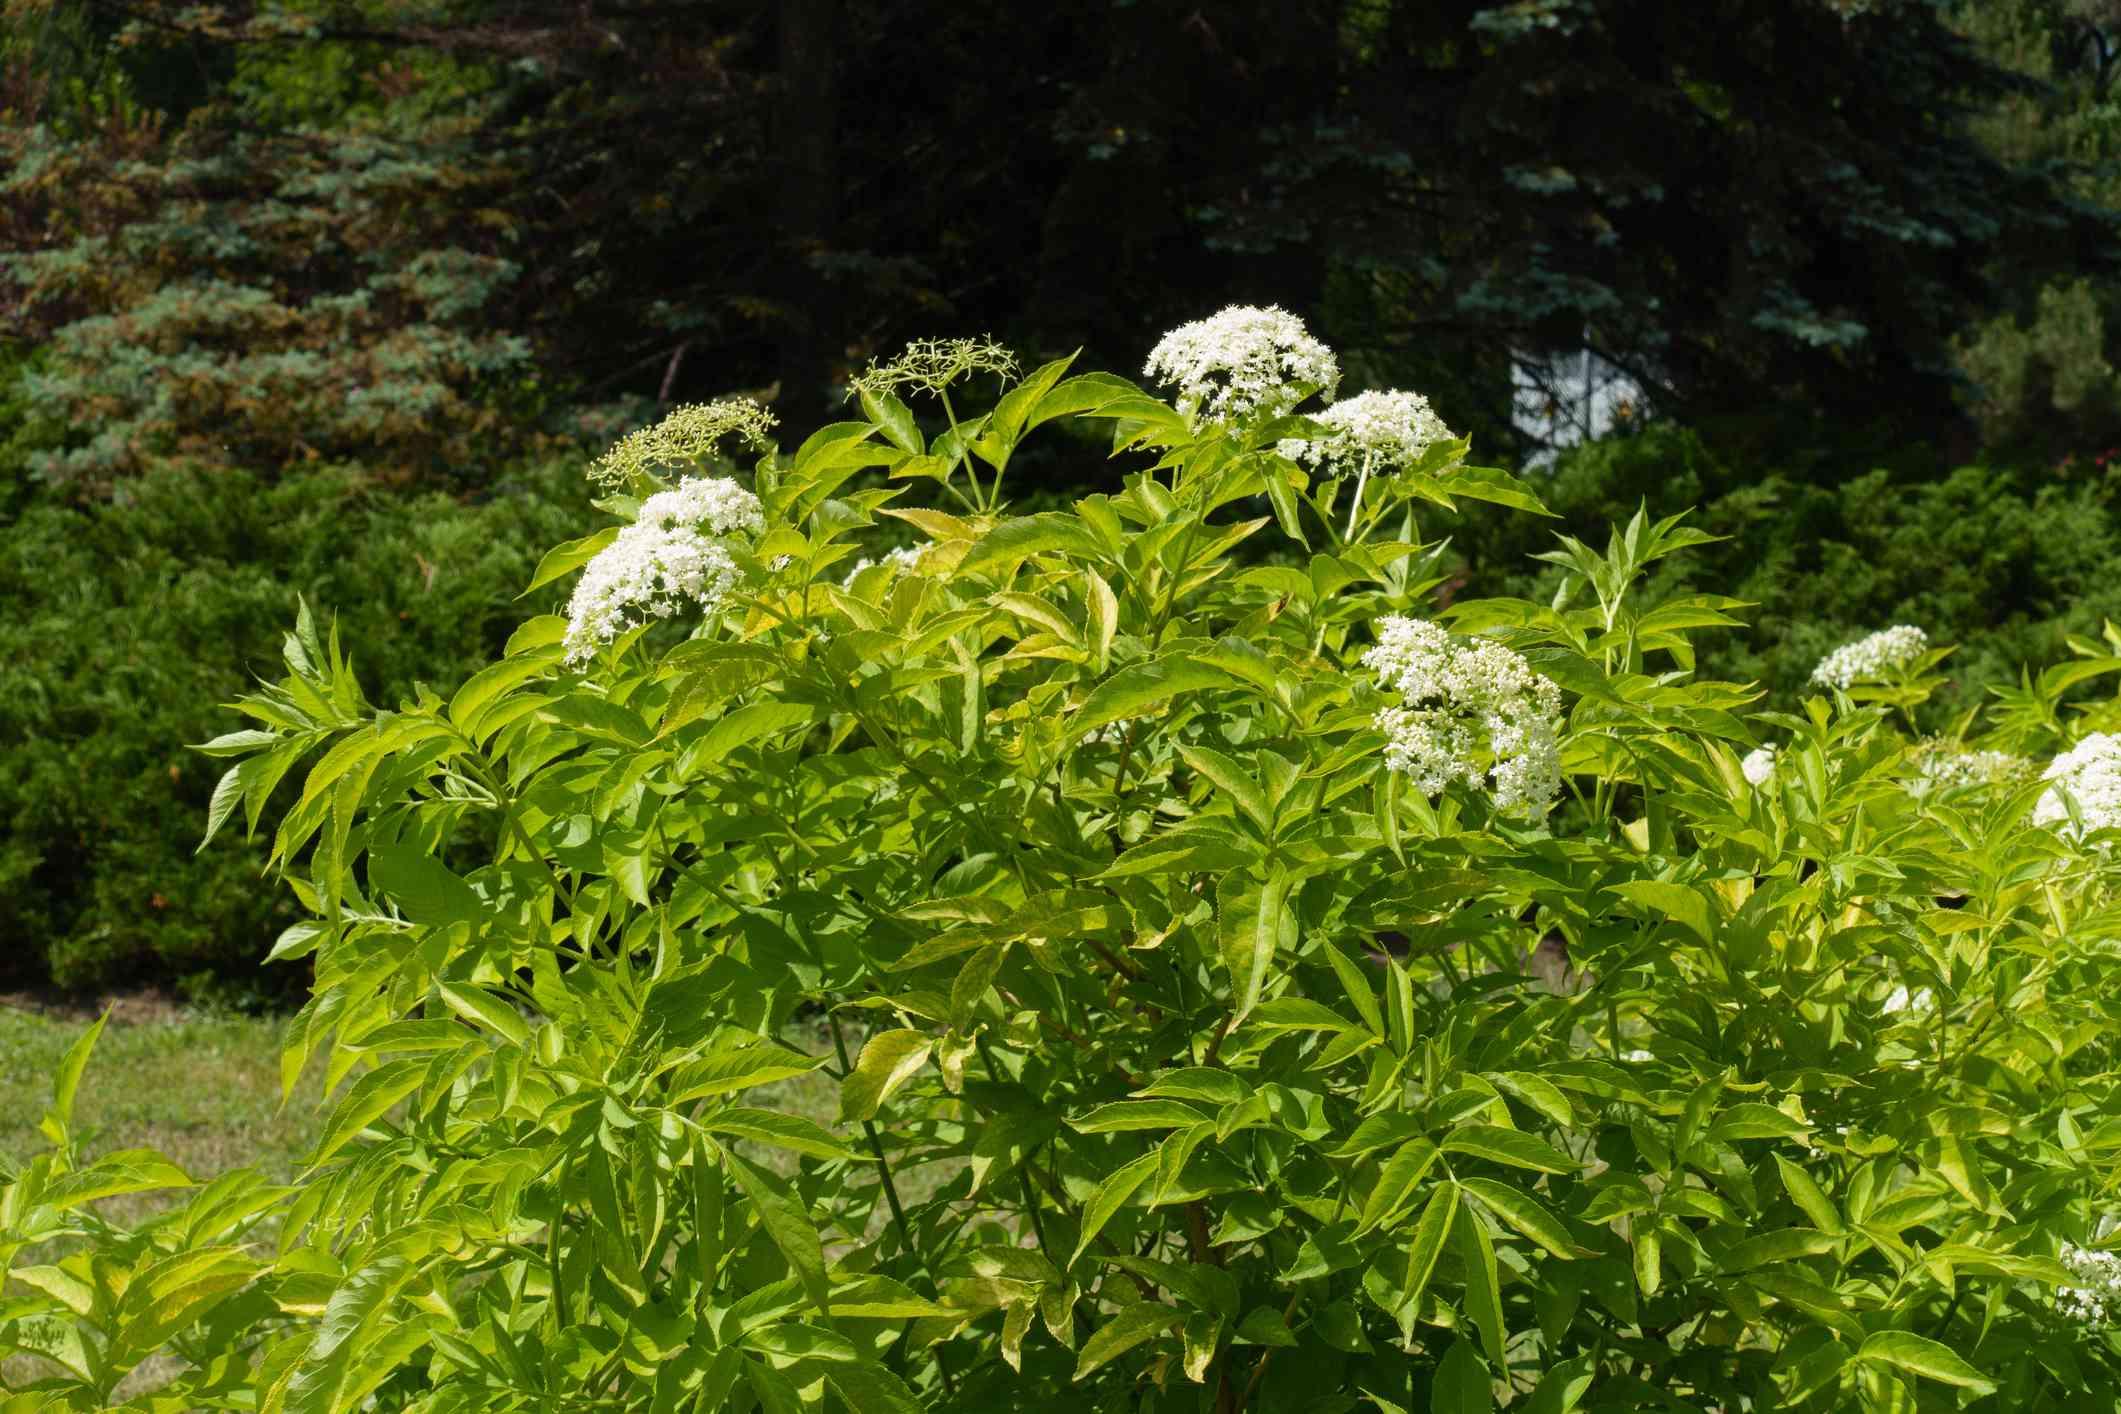 A bushy green elderberry bush with white flowers.